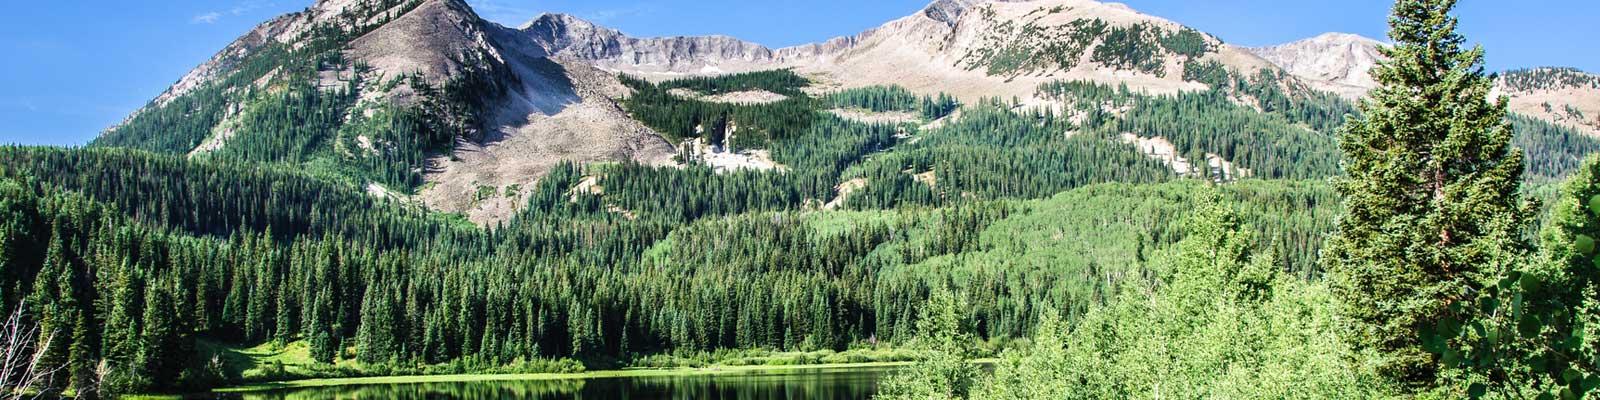 As Grandes Montanhas dos Estados Unidos Compre, Venda. Vilas e Pousadas.